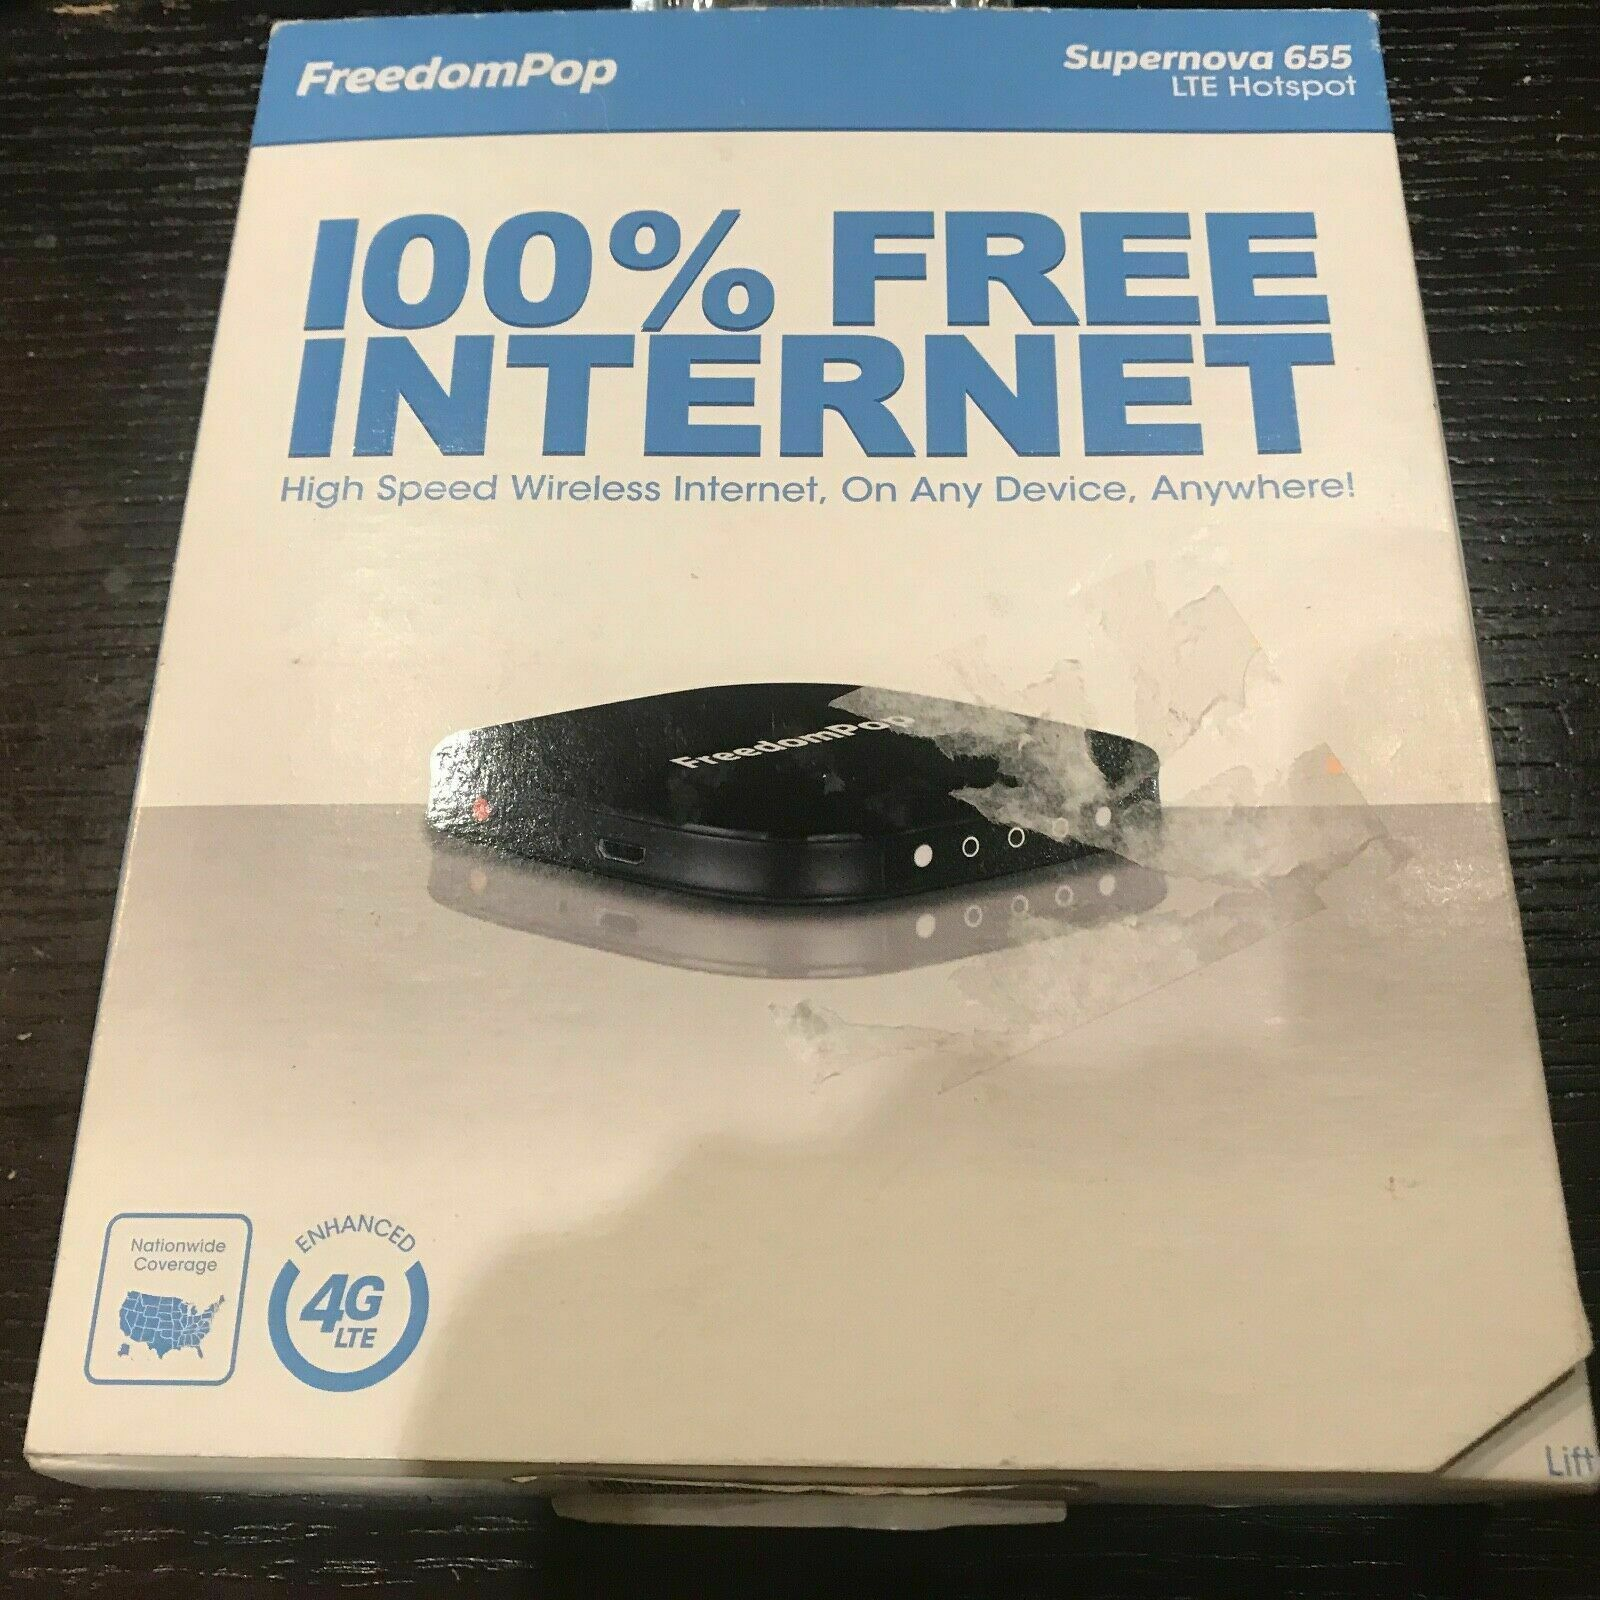 FreedomPop Supernova 655 LTE Hotspot 100 Internet